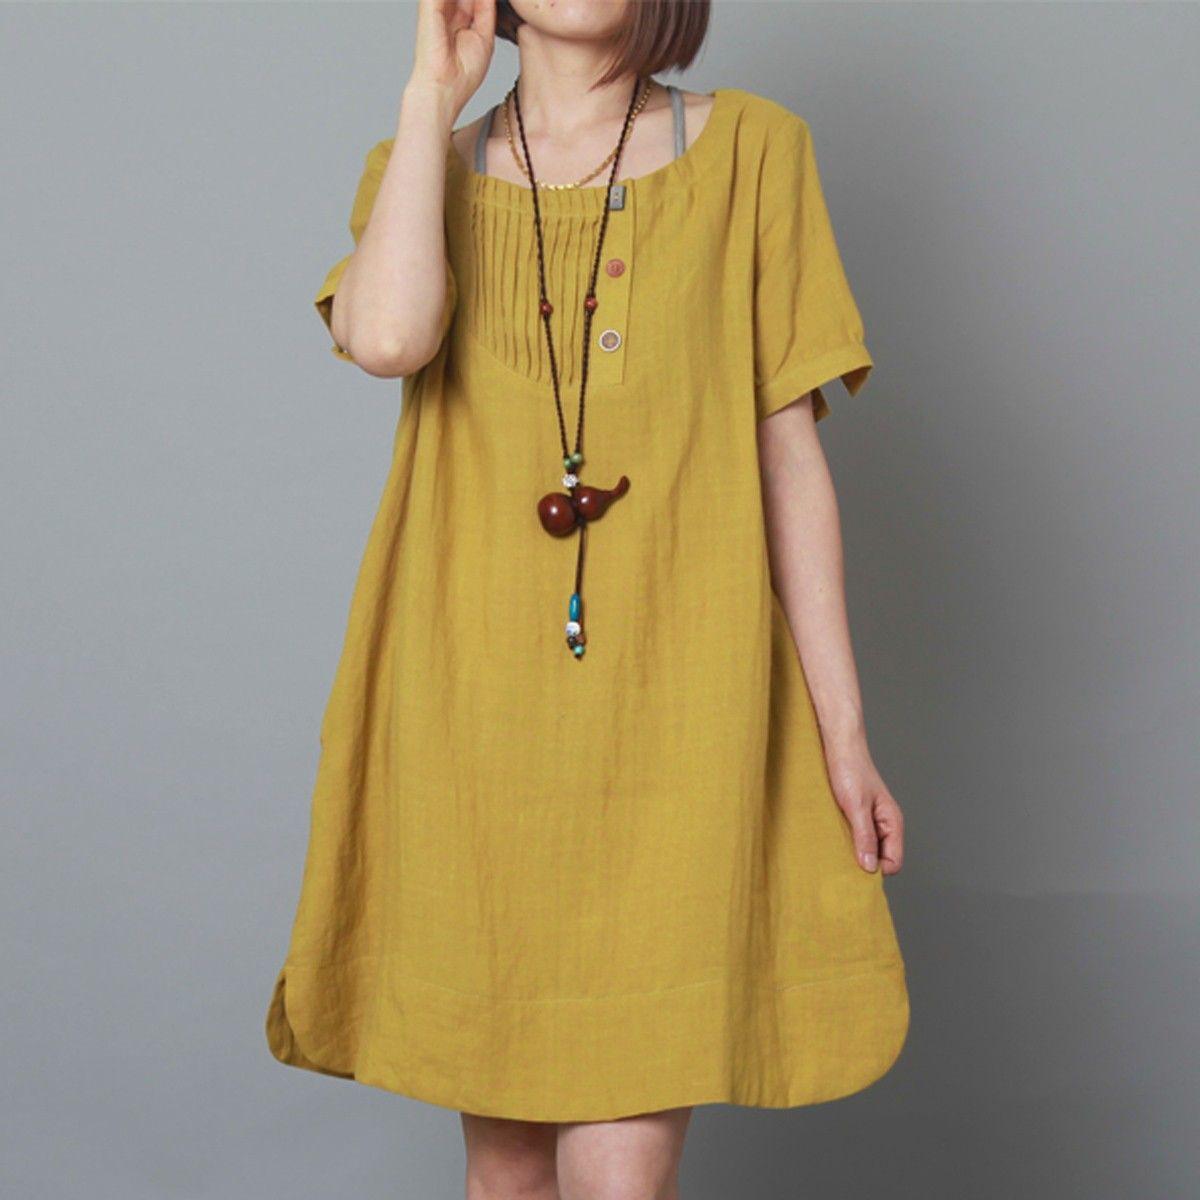 Linen mumu dress plus size